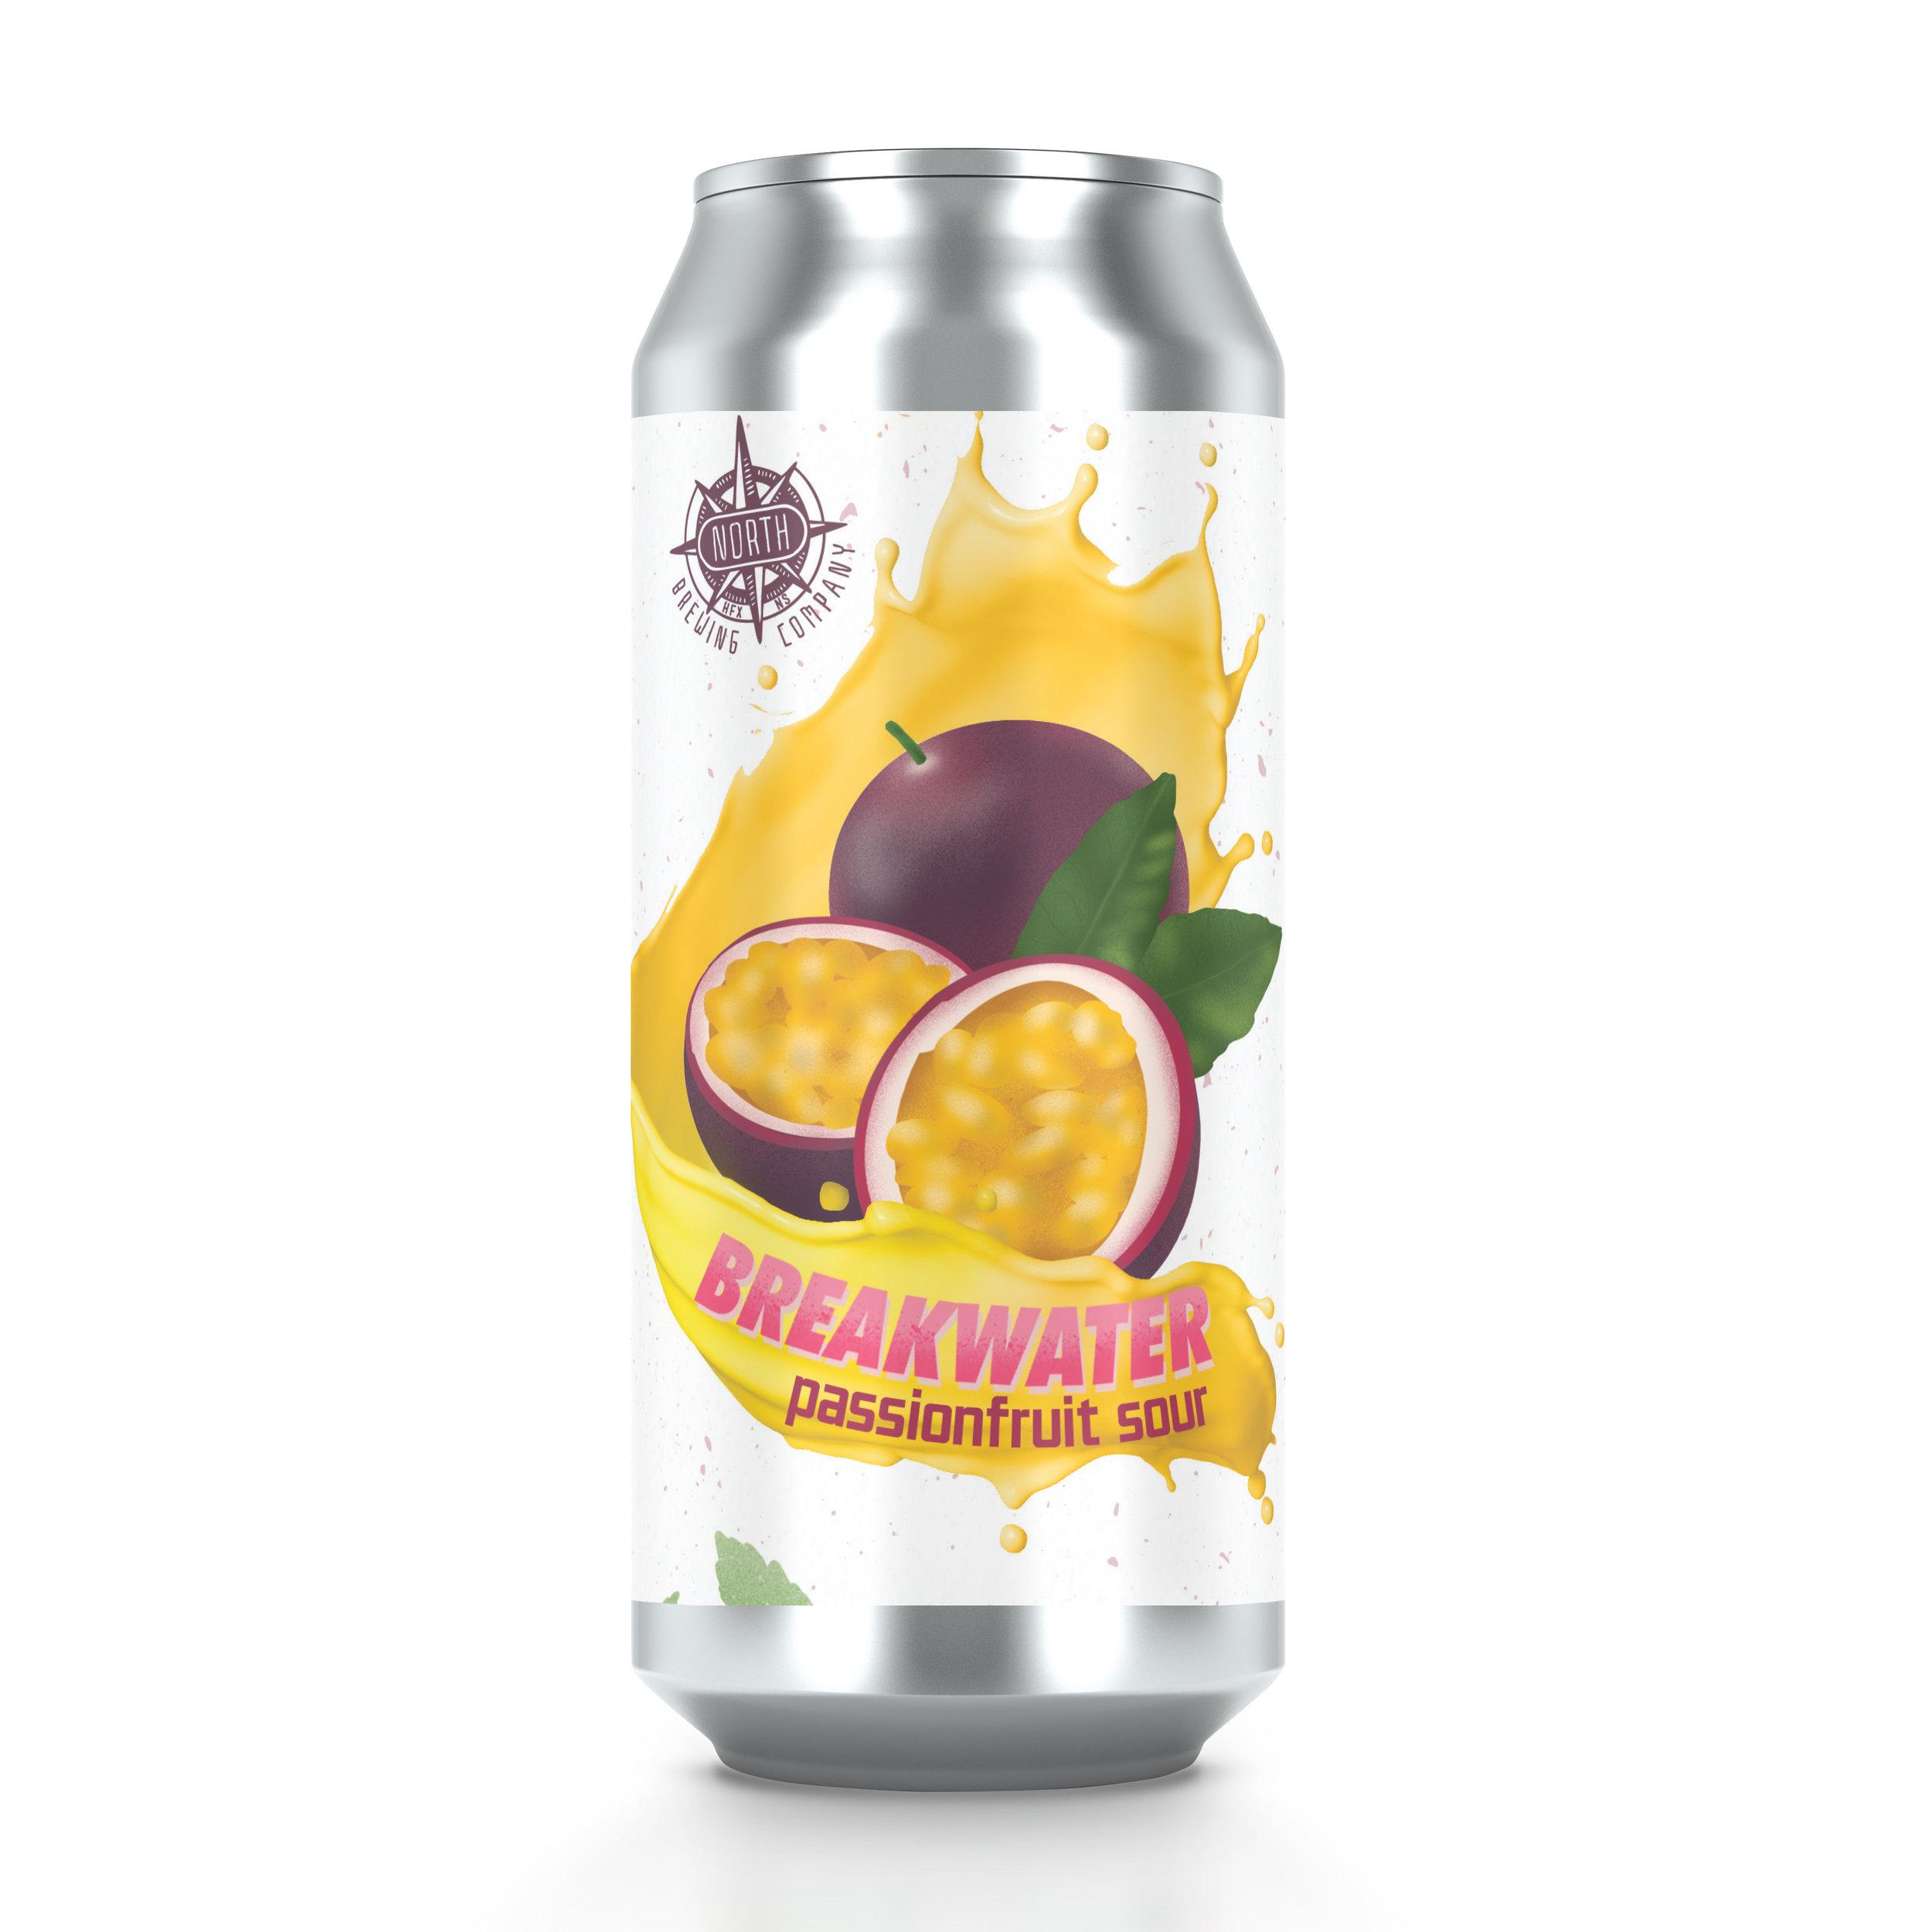 Breakwater Passionfruit Sour